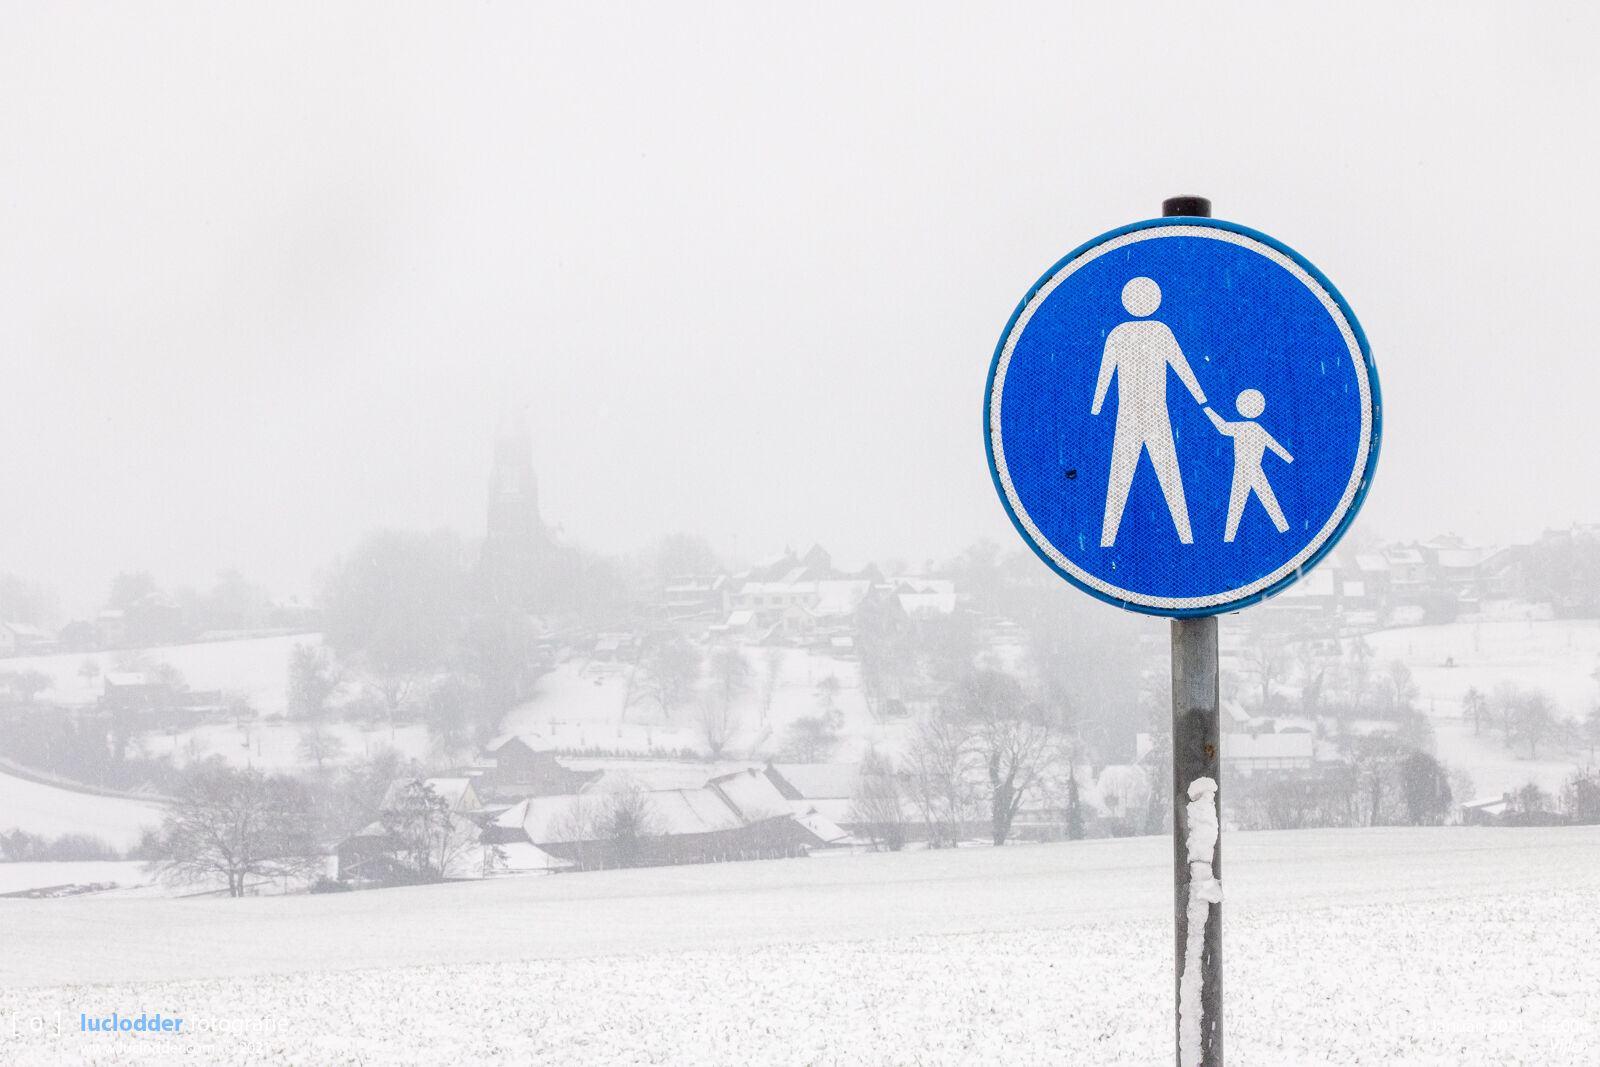 Vijlen, Limburg